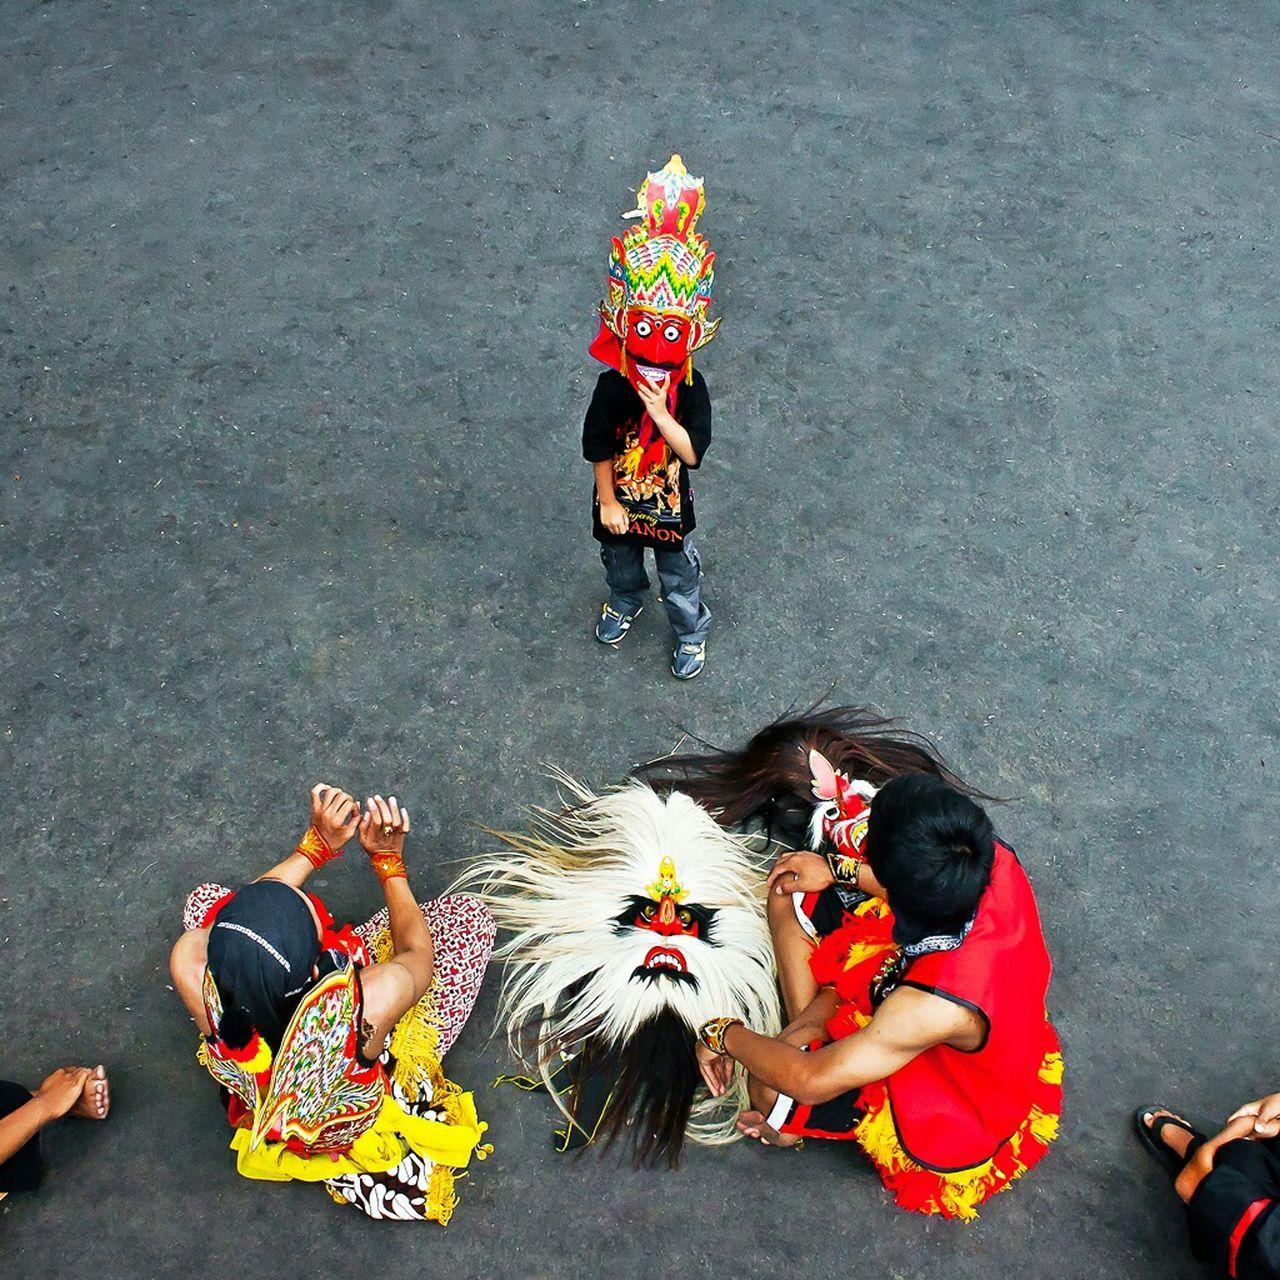 High Angle View Of Folk Dancers